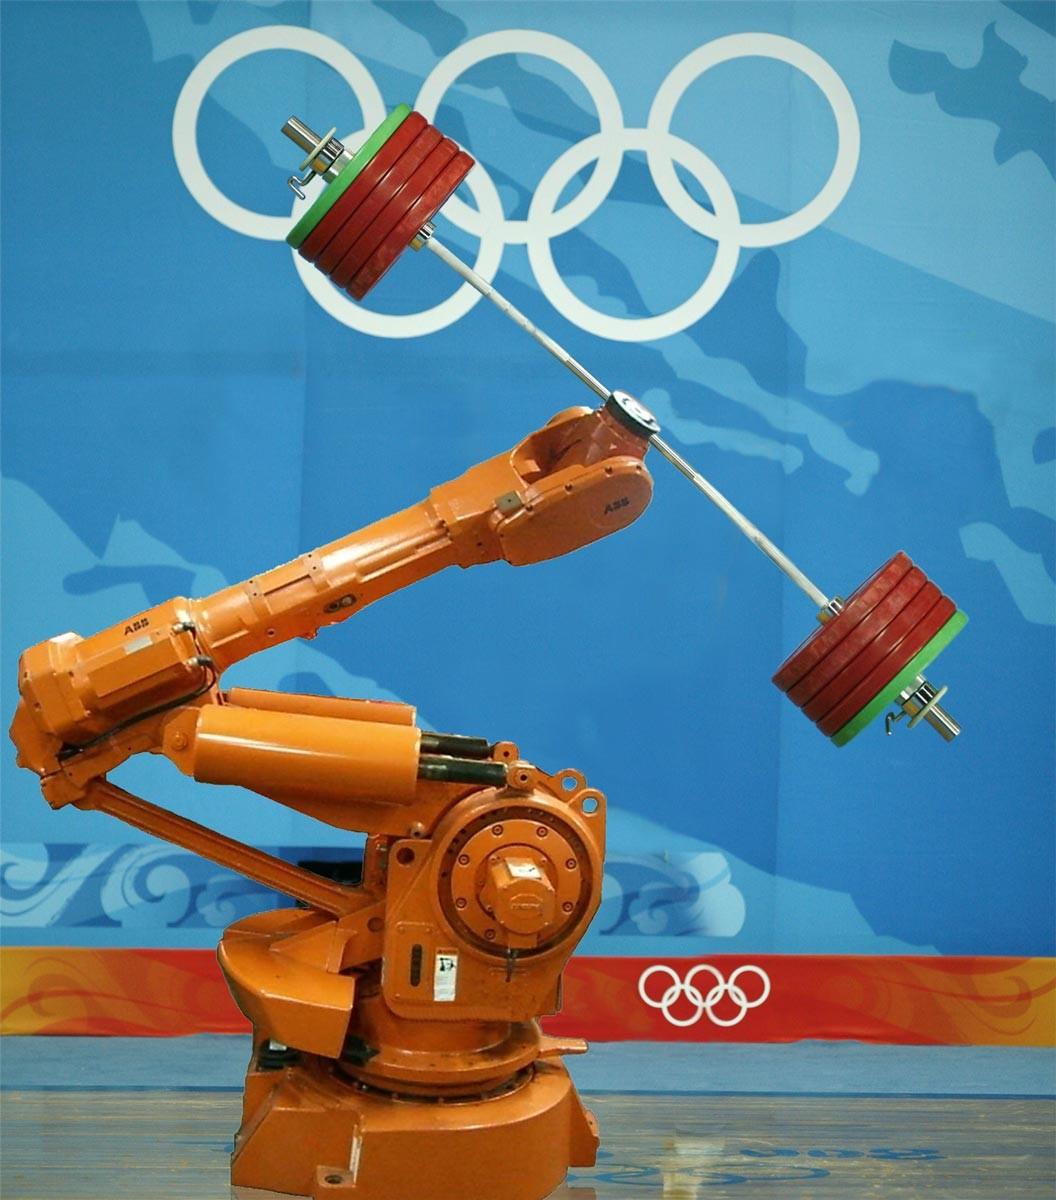 2012 Robot Olympics Weightlighting